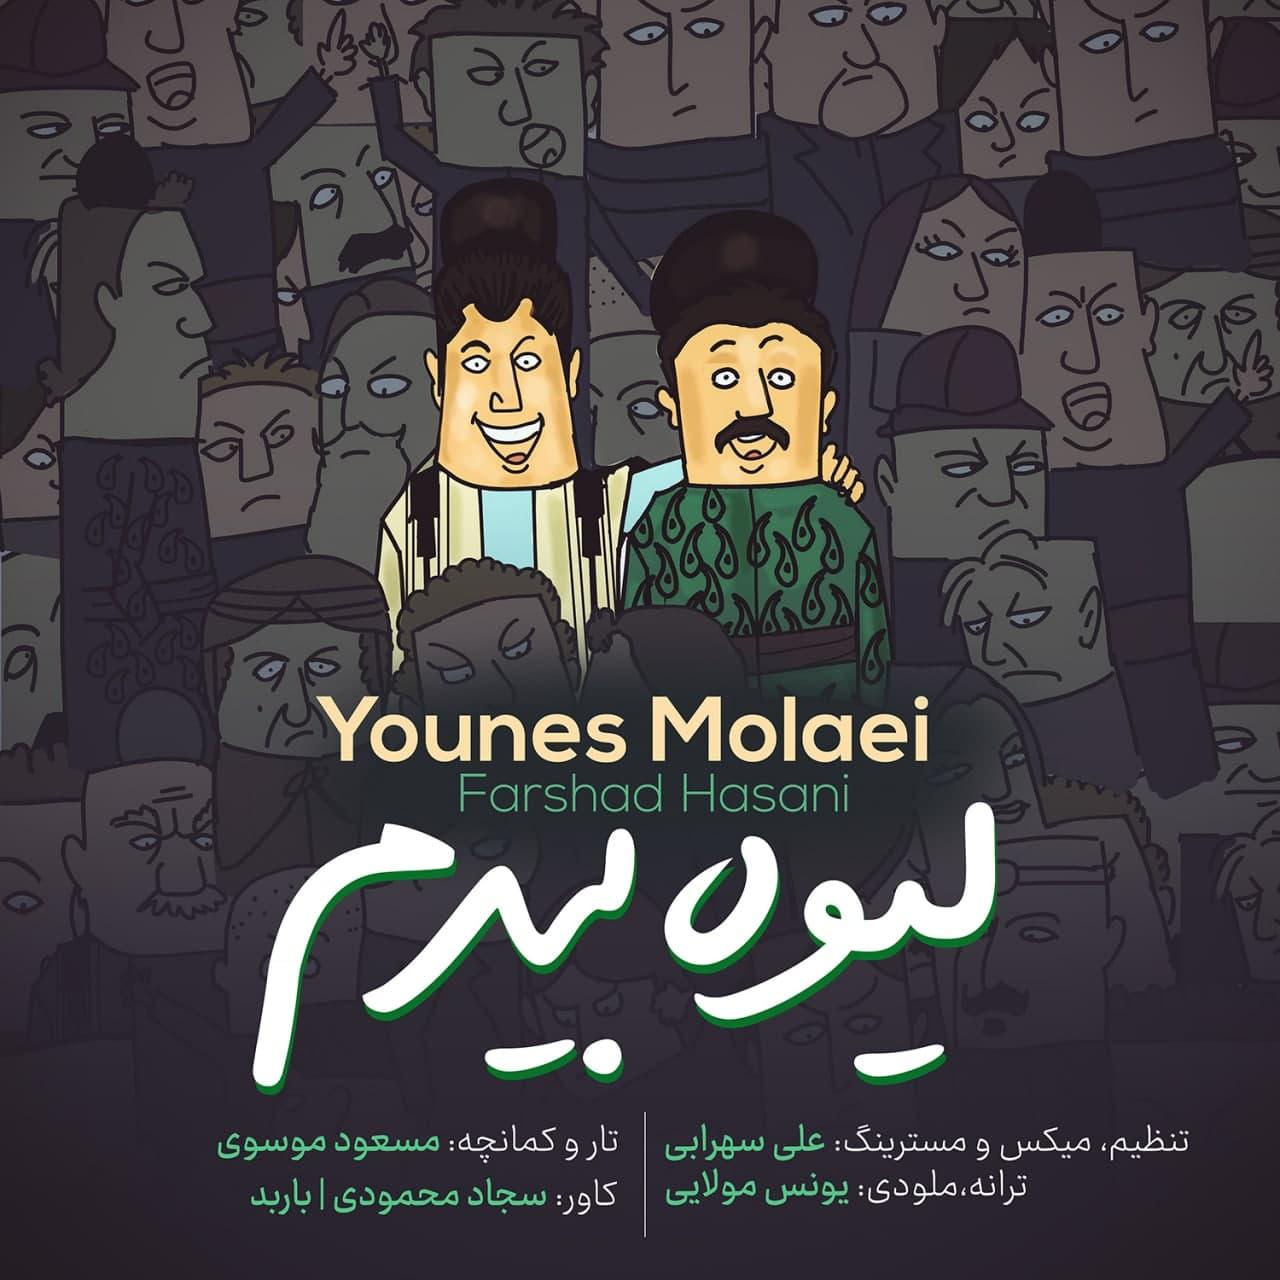 Younes Molaei – Liveh Bidom (Ft Farshad Hasani)